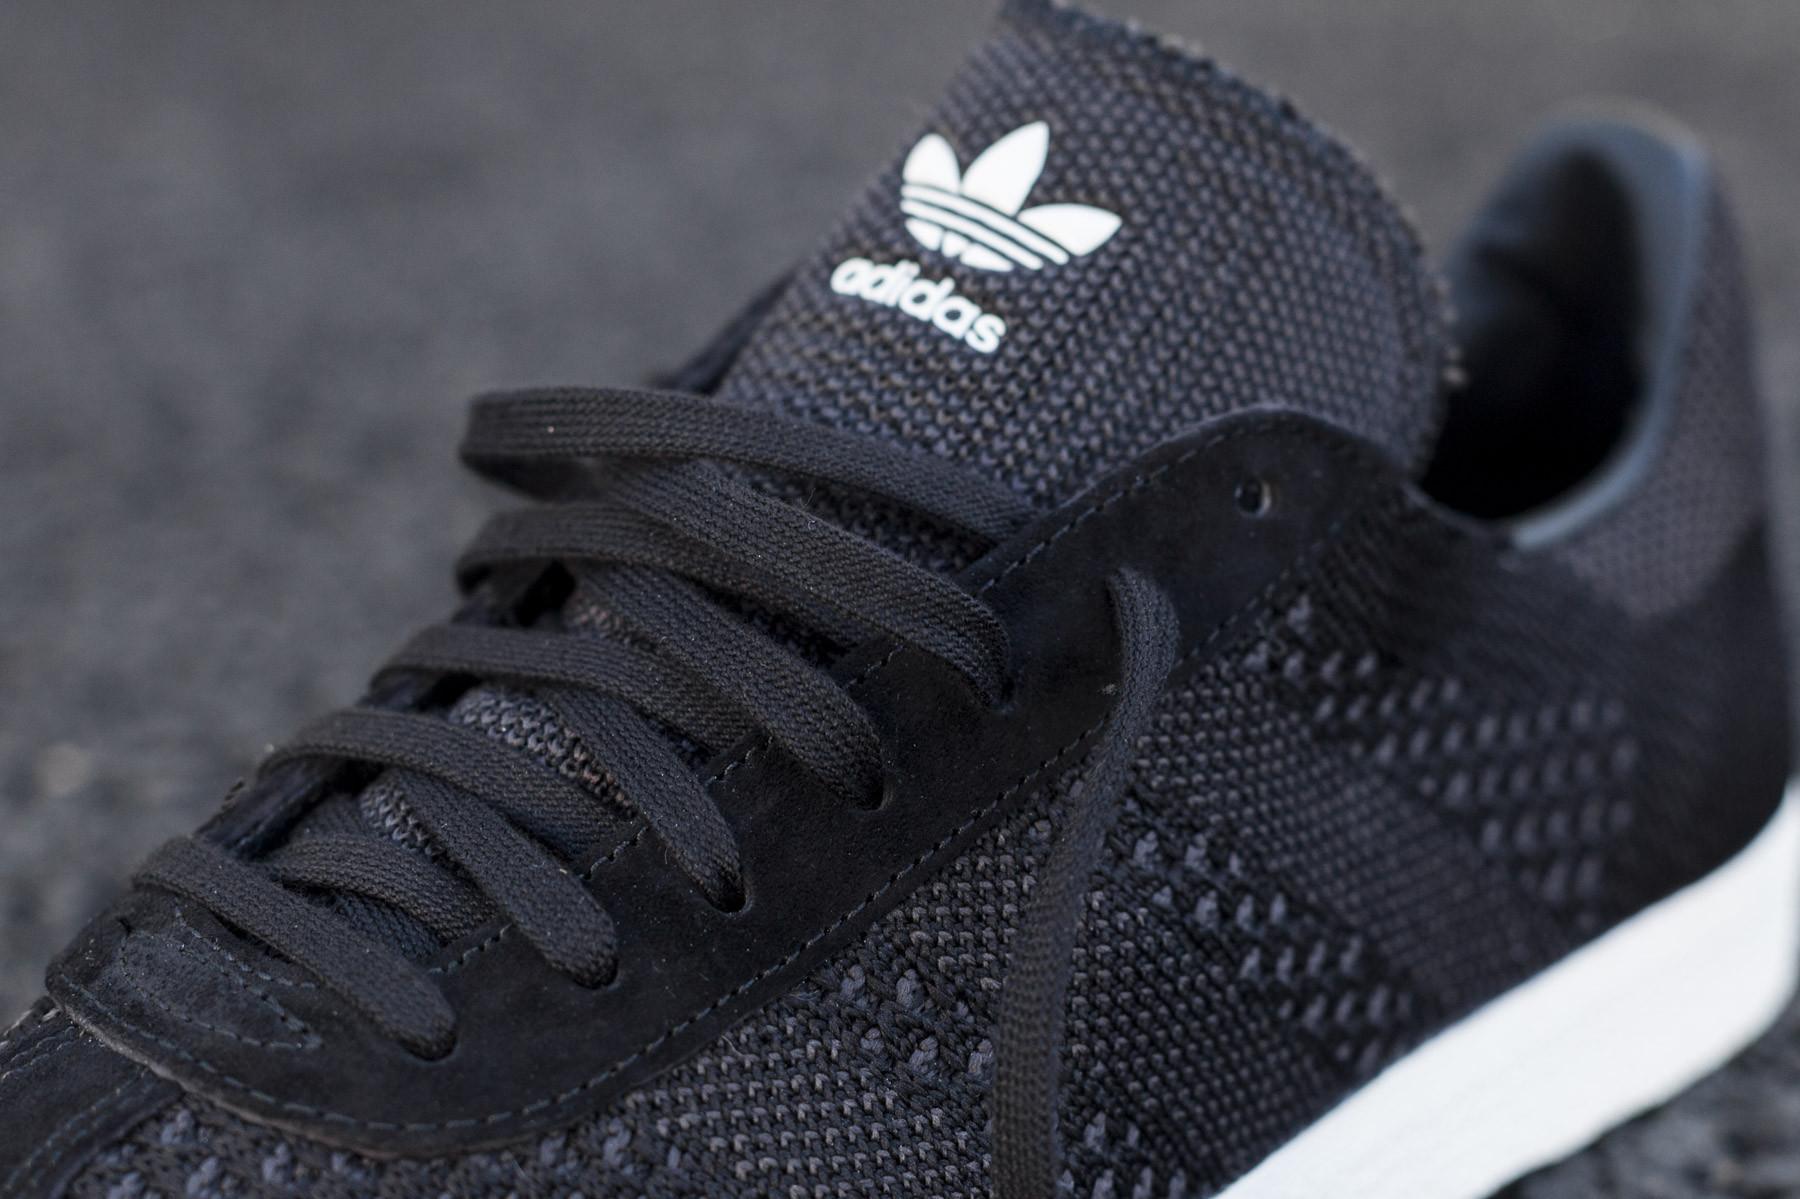 fb4a2af25372 Adidas Gazelle PK - Herre - Sneakers - Sneaker.no